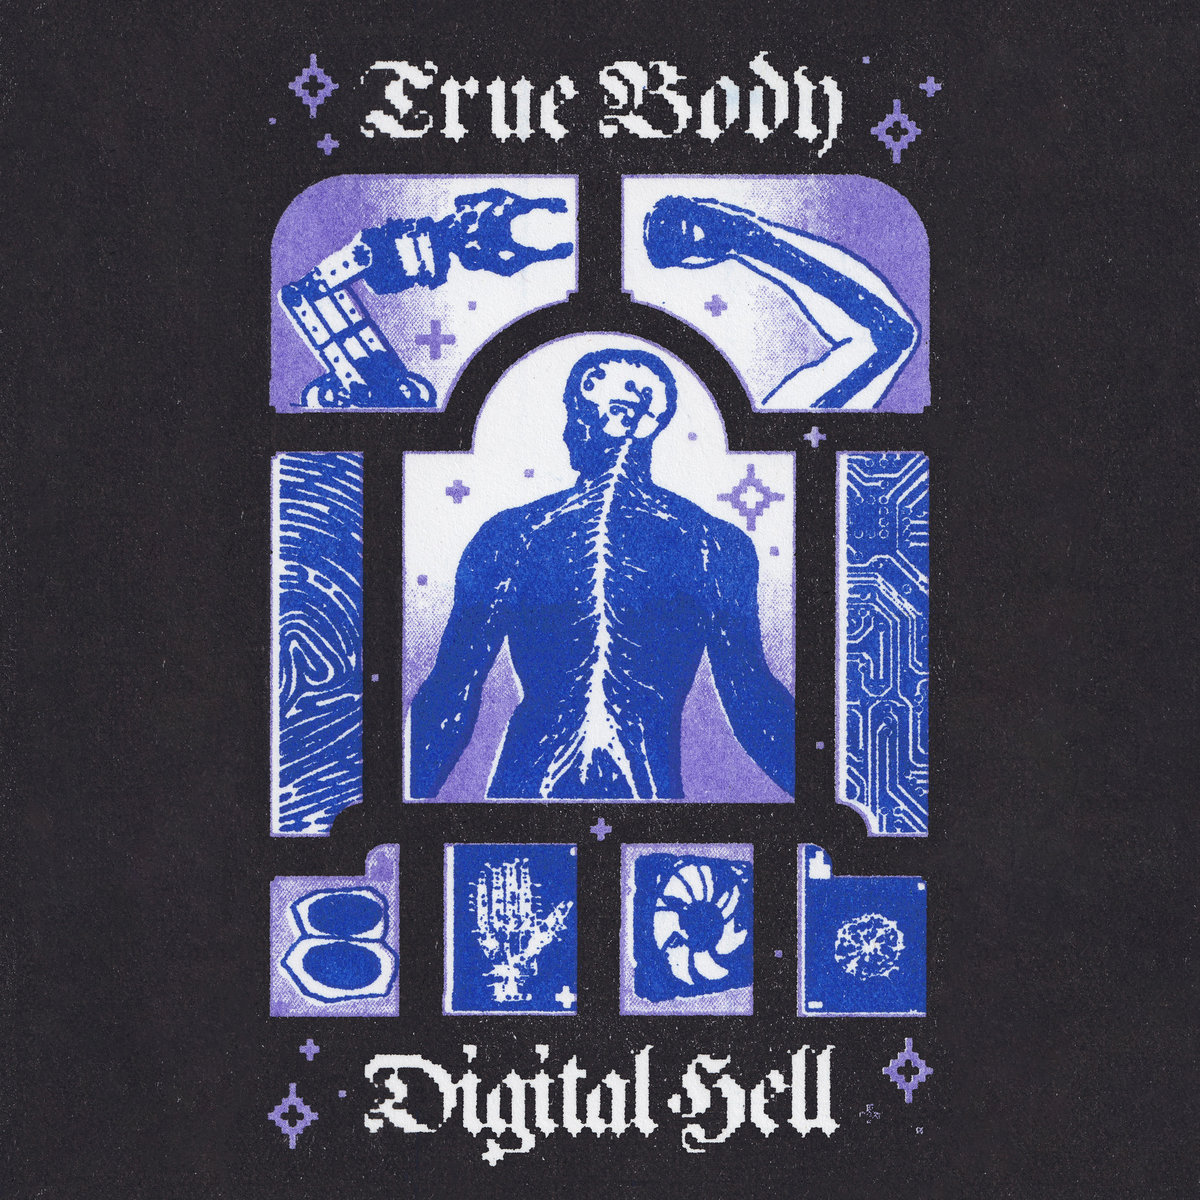 Post-punk shivers – True Body & Digital Hell